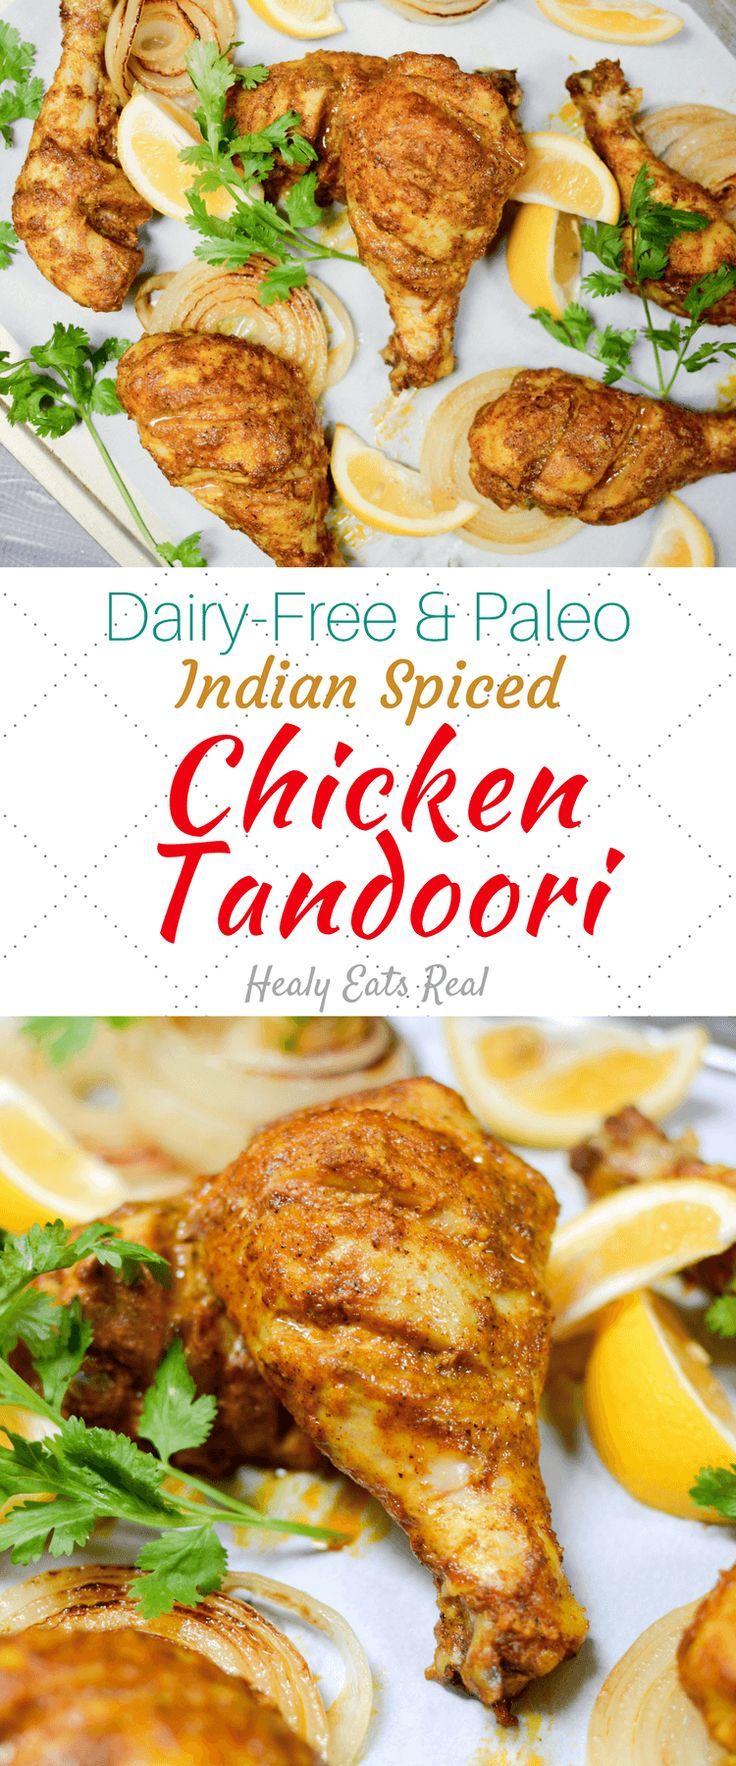 Chicken Tandoori Recipe (Dairy Free & Paleo)- great healthy lunch or dinner recipe!